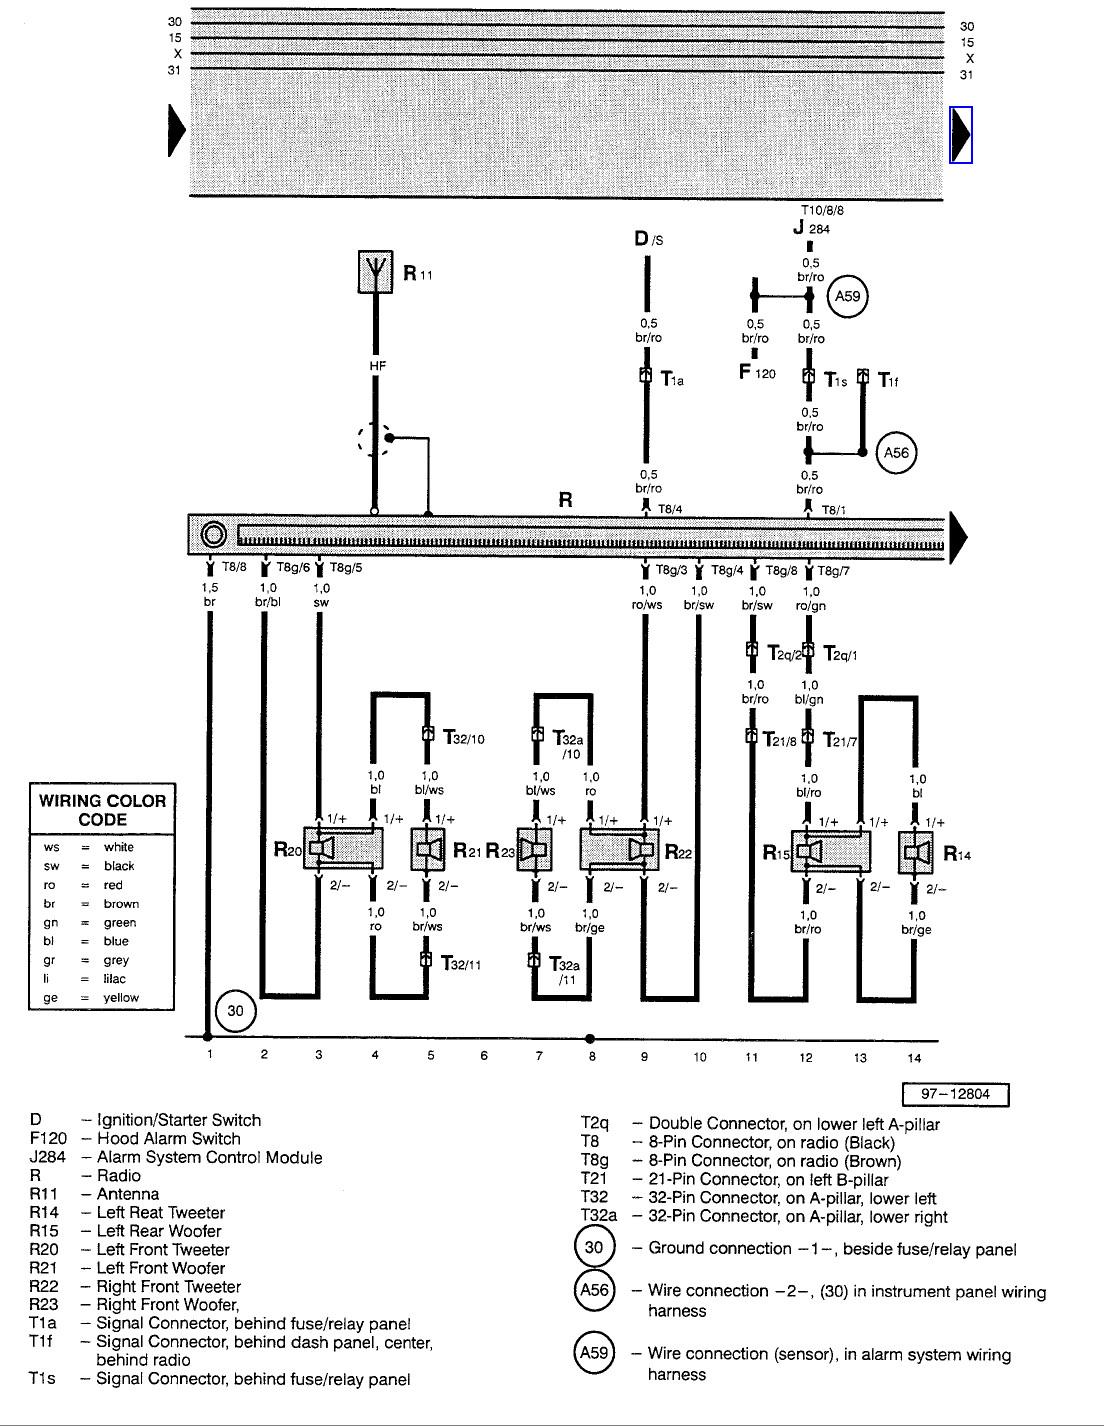 1996 vw jetta wiring diagrams 2013 jetta wiring diagram wiring diagram data  2013 jetta wiring diagram wiring